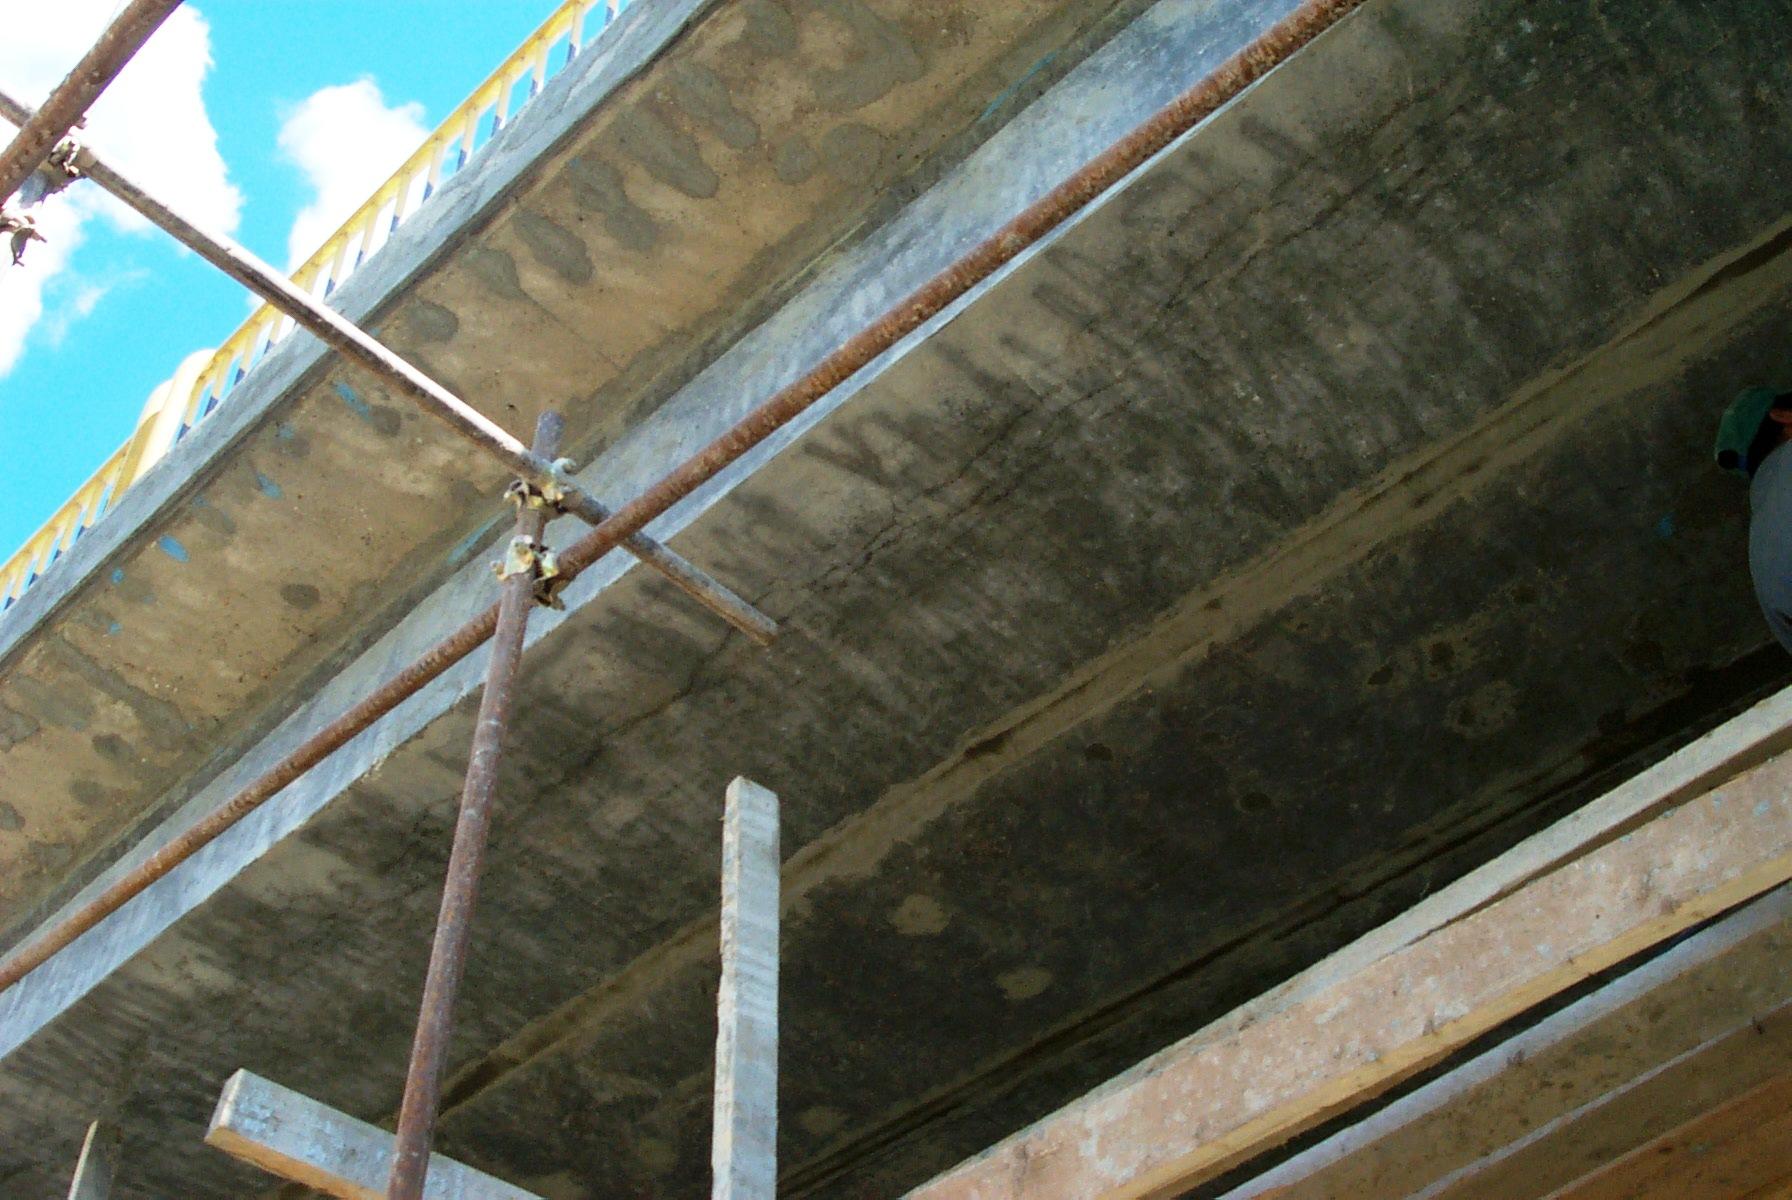 Reparatii pod (DN2), Km. 33 - 028, peste raul Calnistea MAPEI - Poza 9